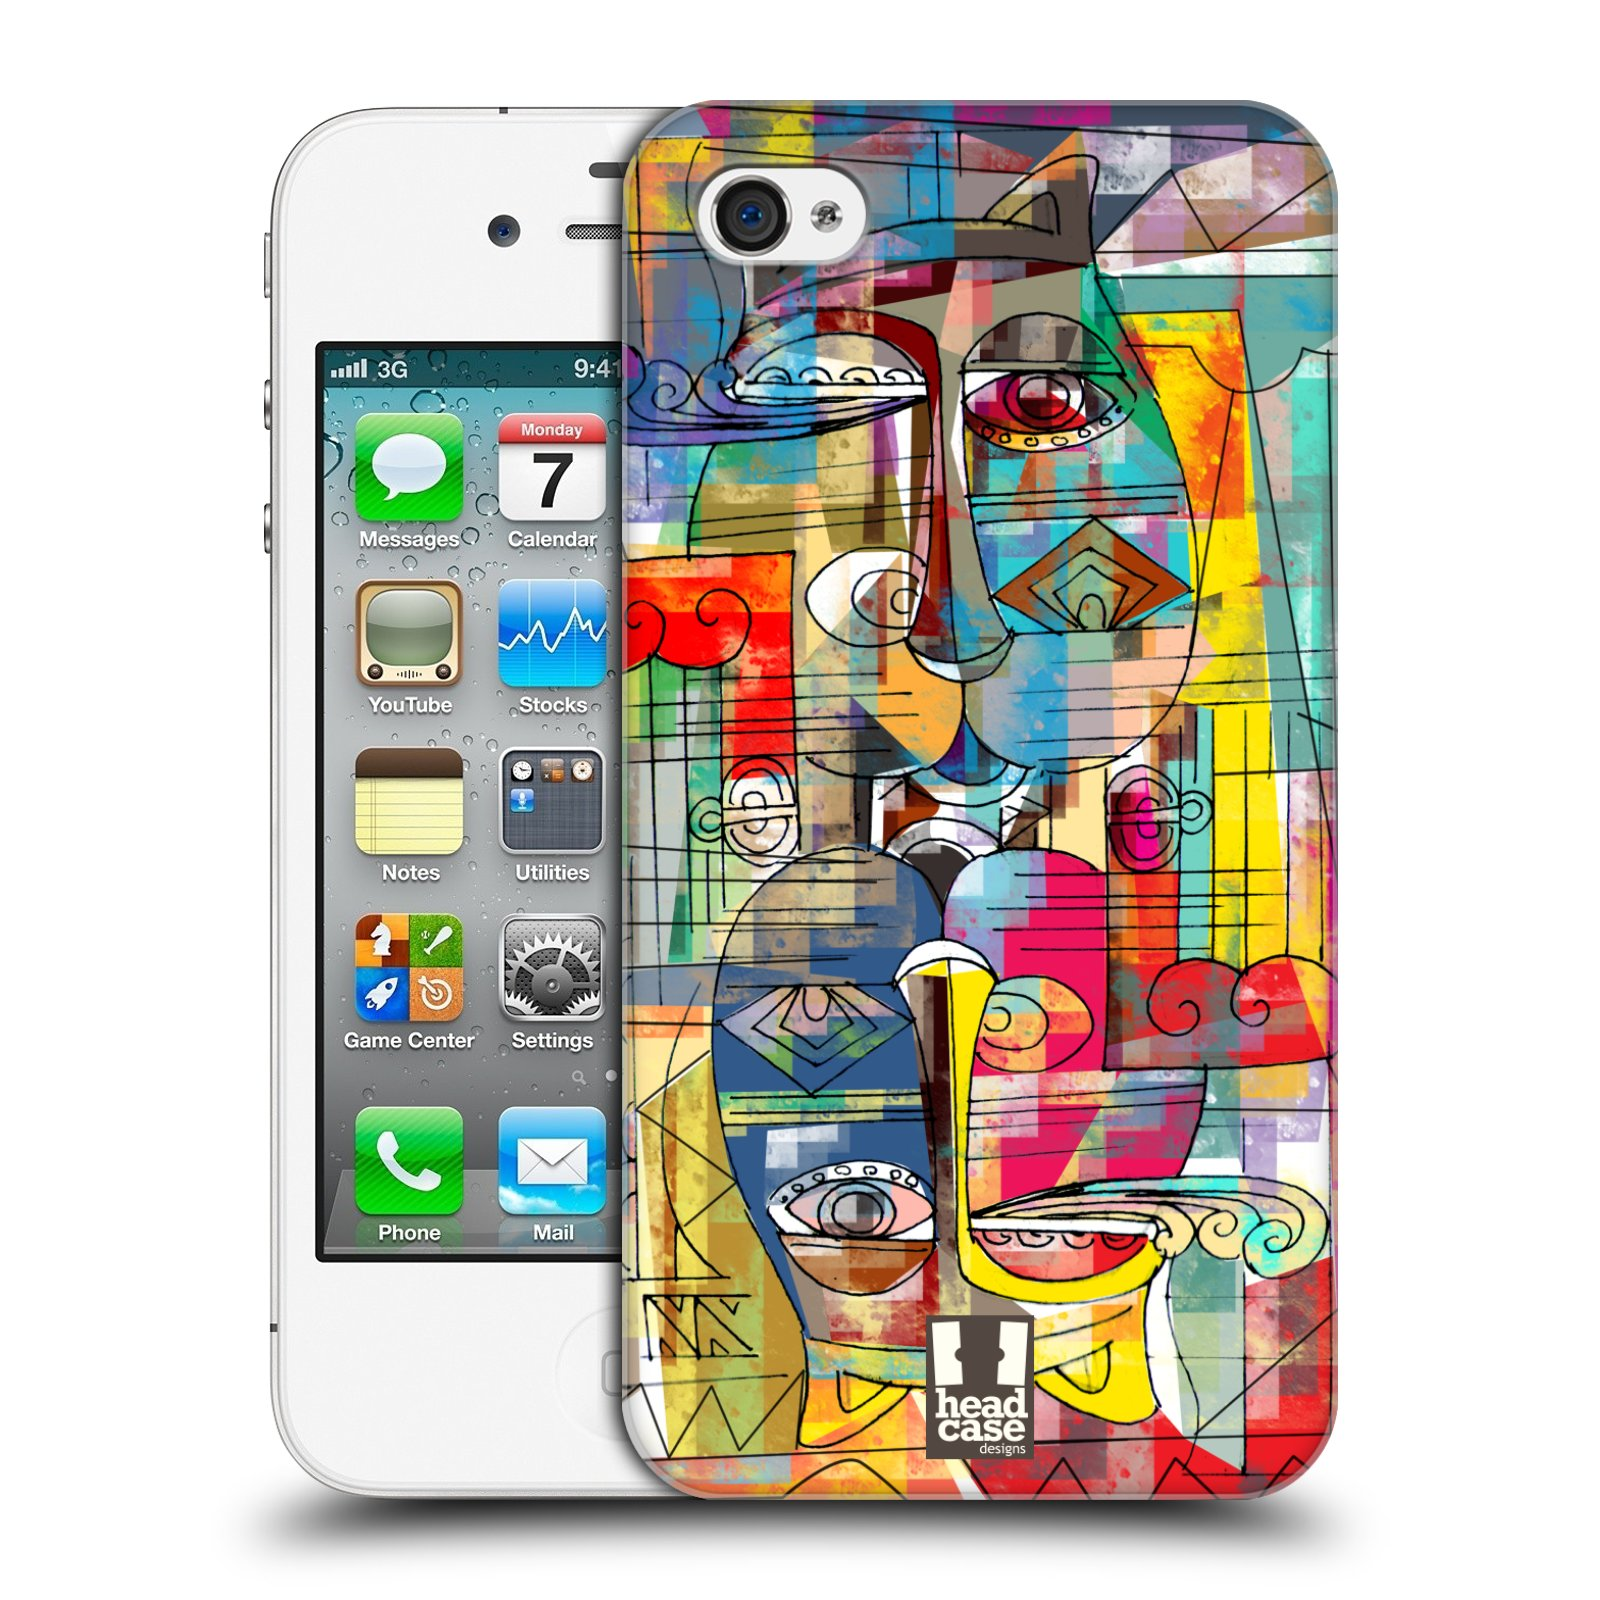 Plastové pouzdro na mobil Apple iPhone 4 a 4S HEAD CASE AZTEC MANX